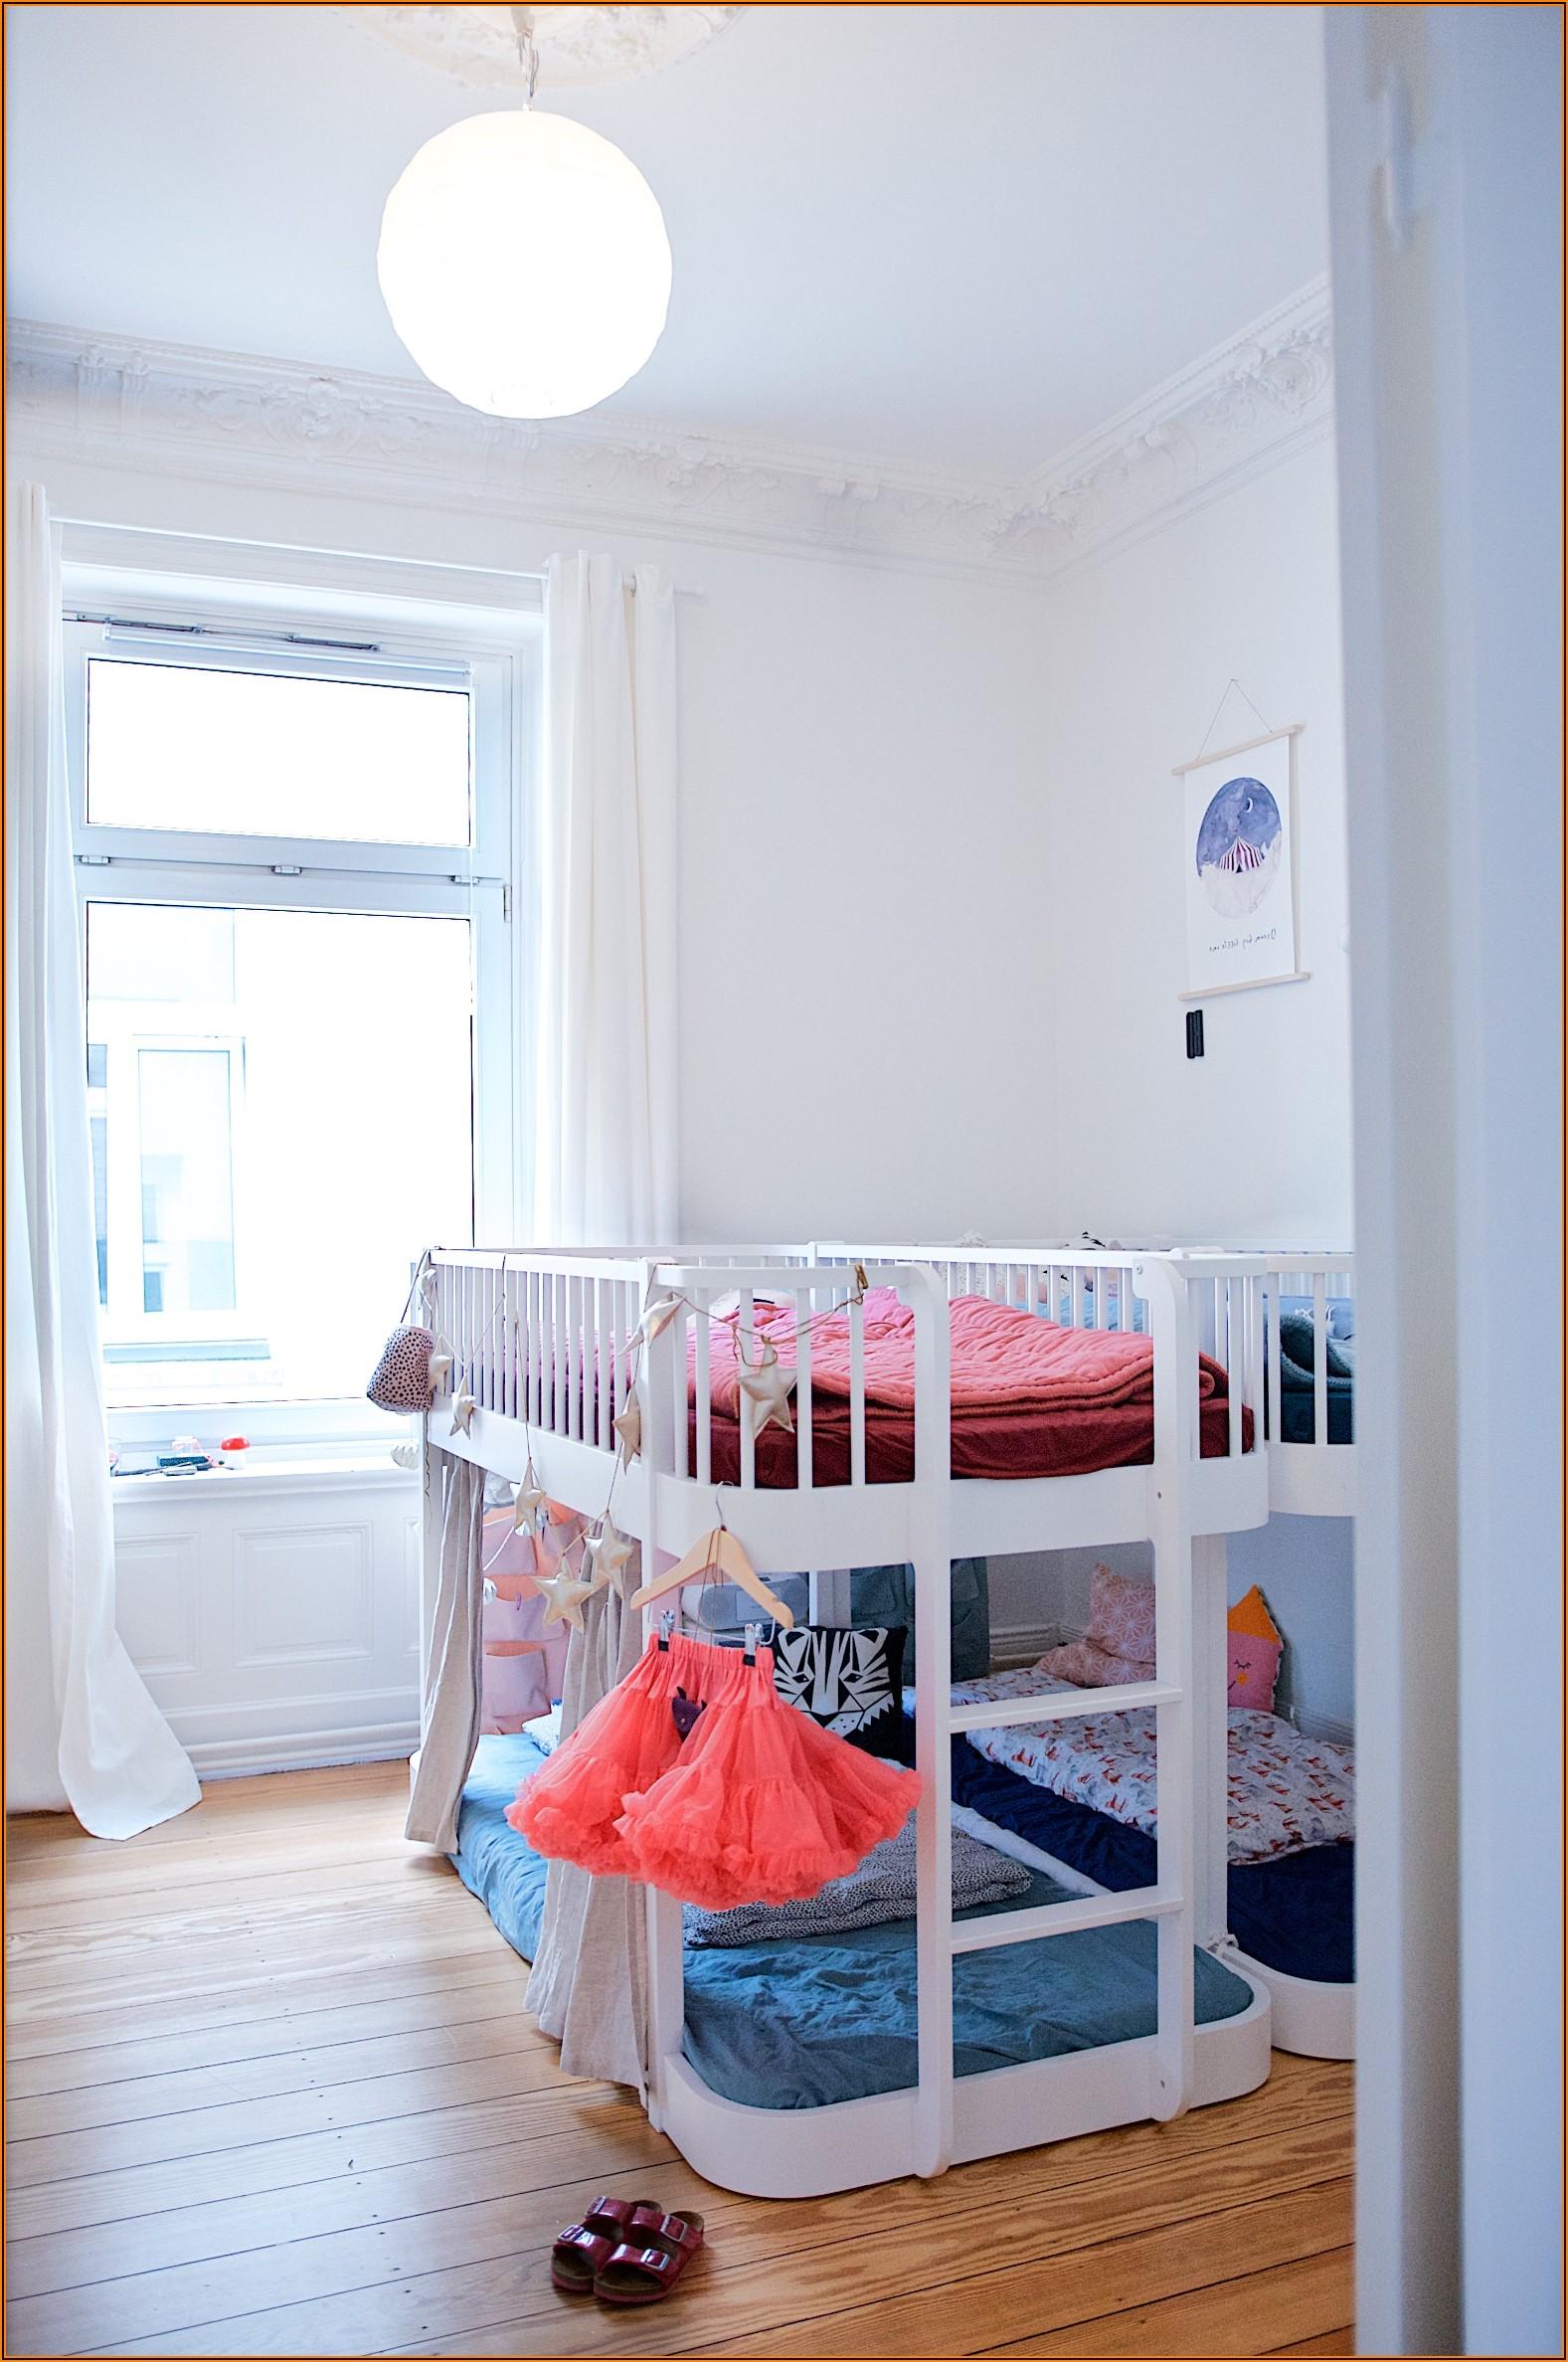 Kinderzimmer Bett Unter Fenster